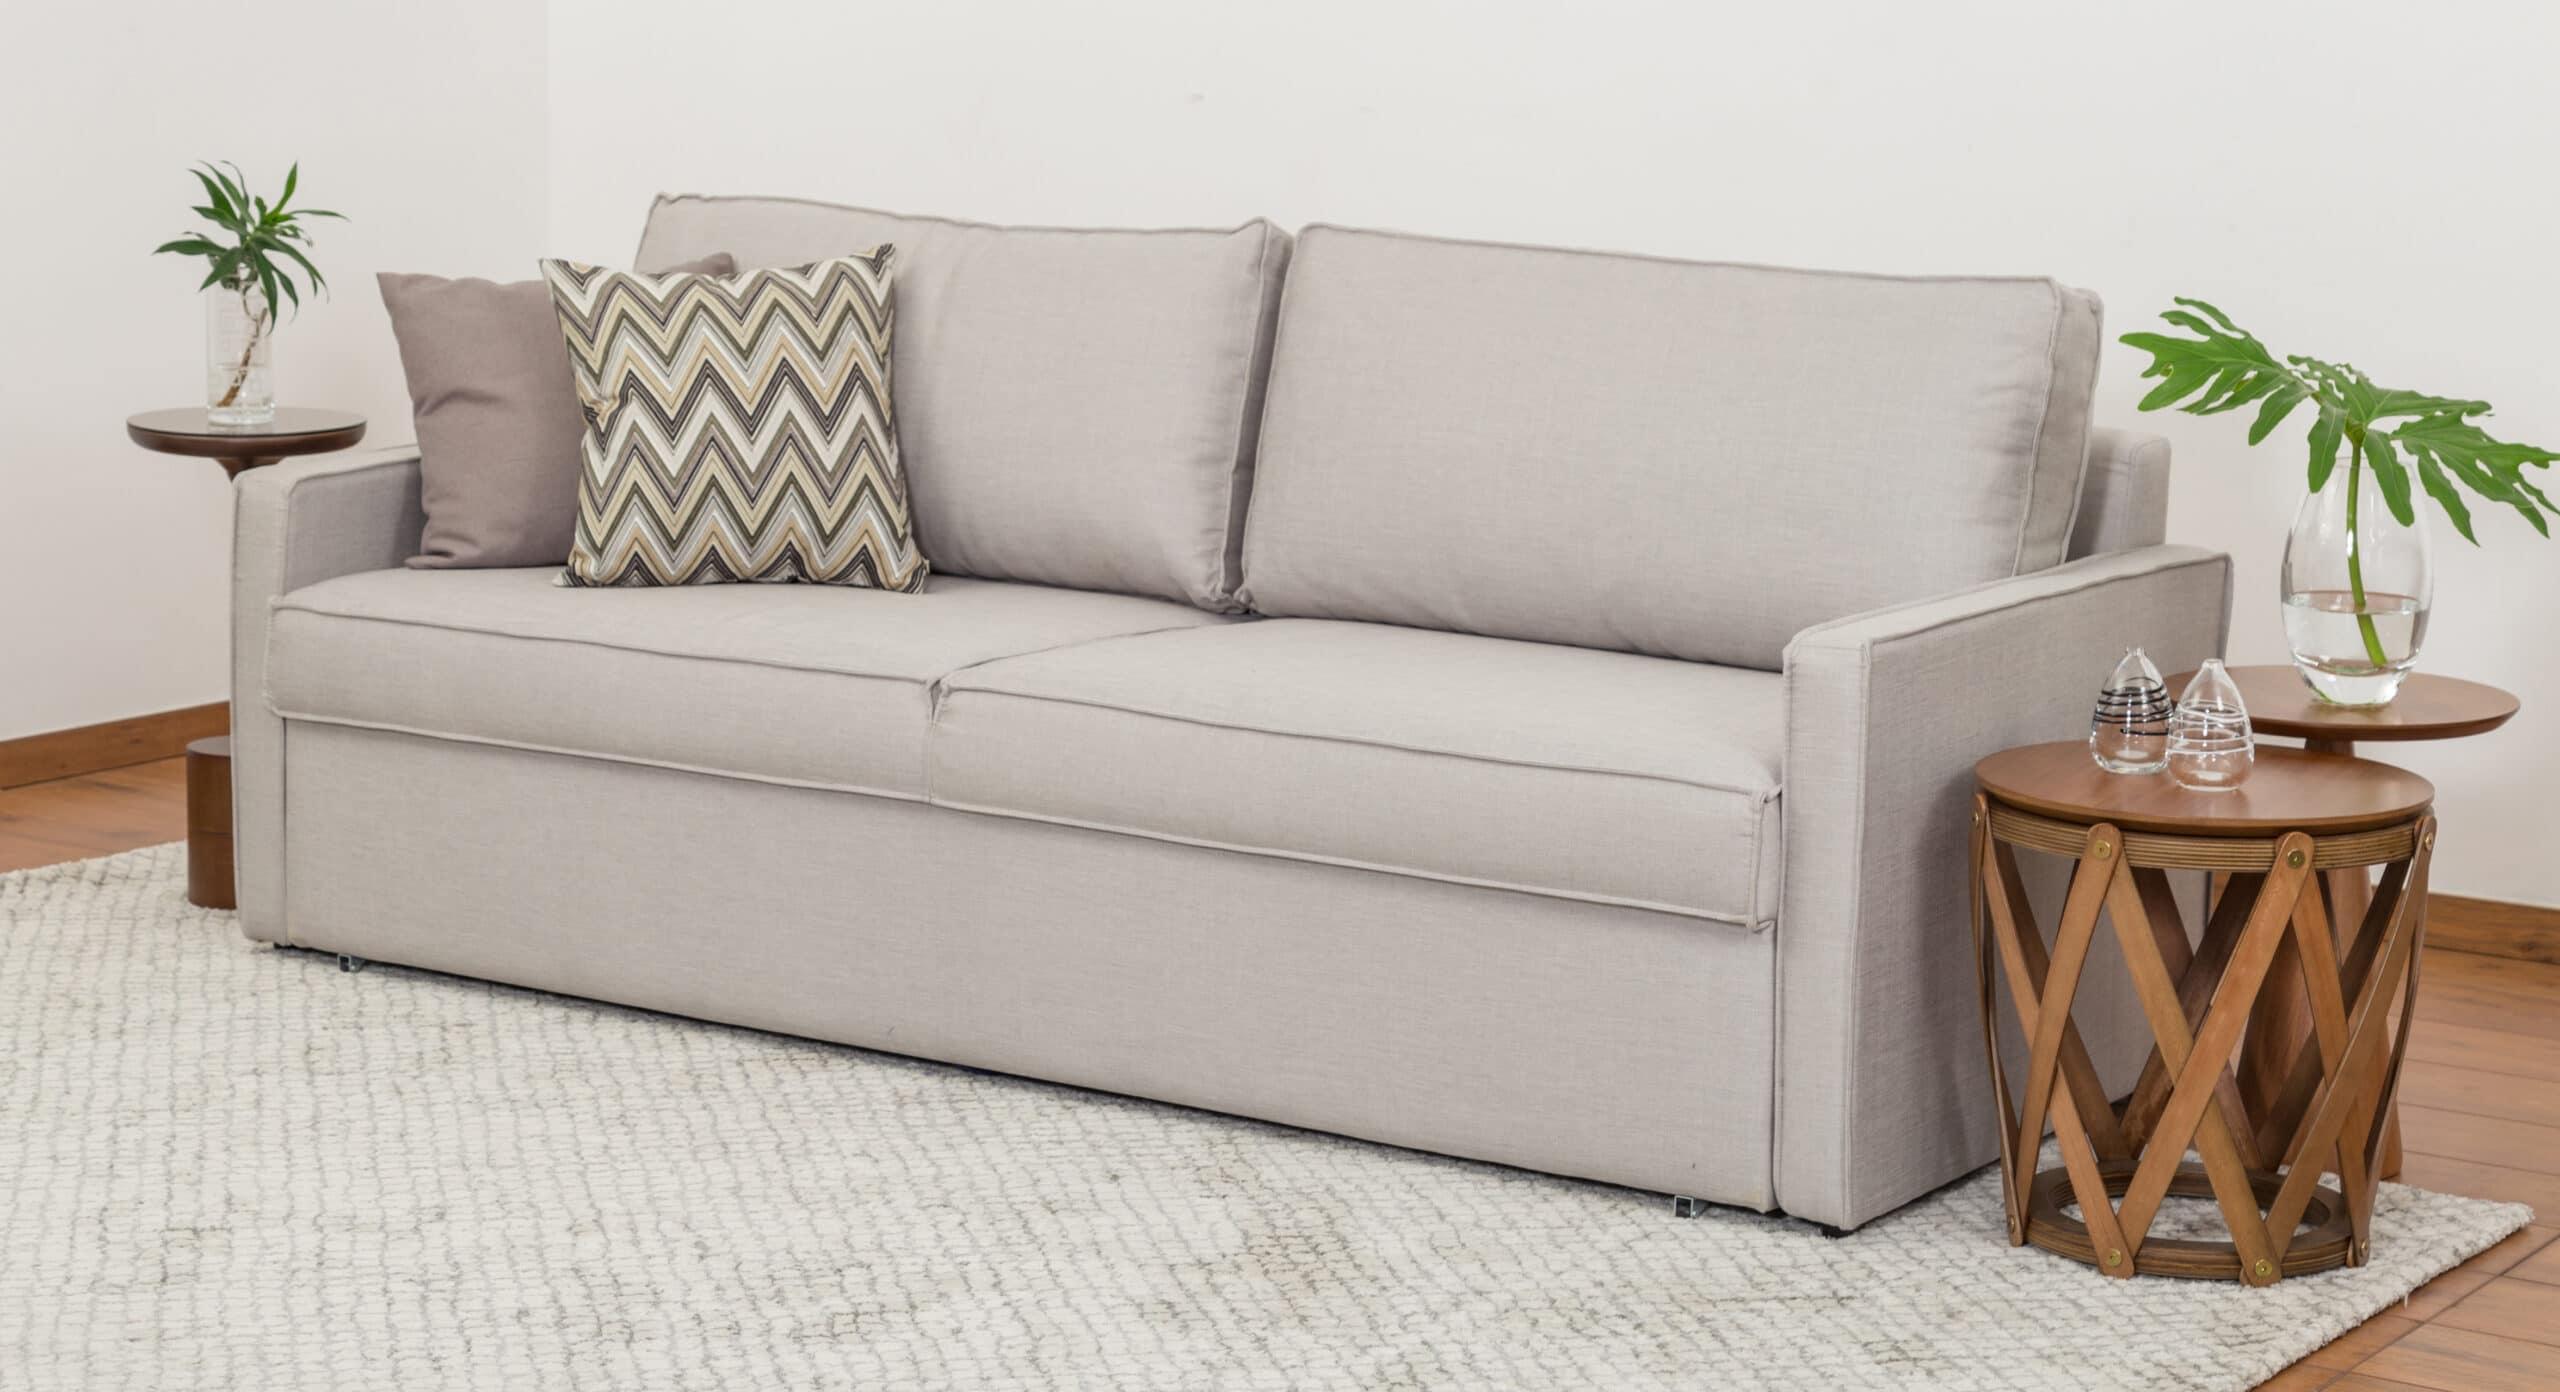 Sofa-cama-cairo2